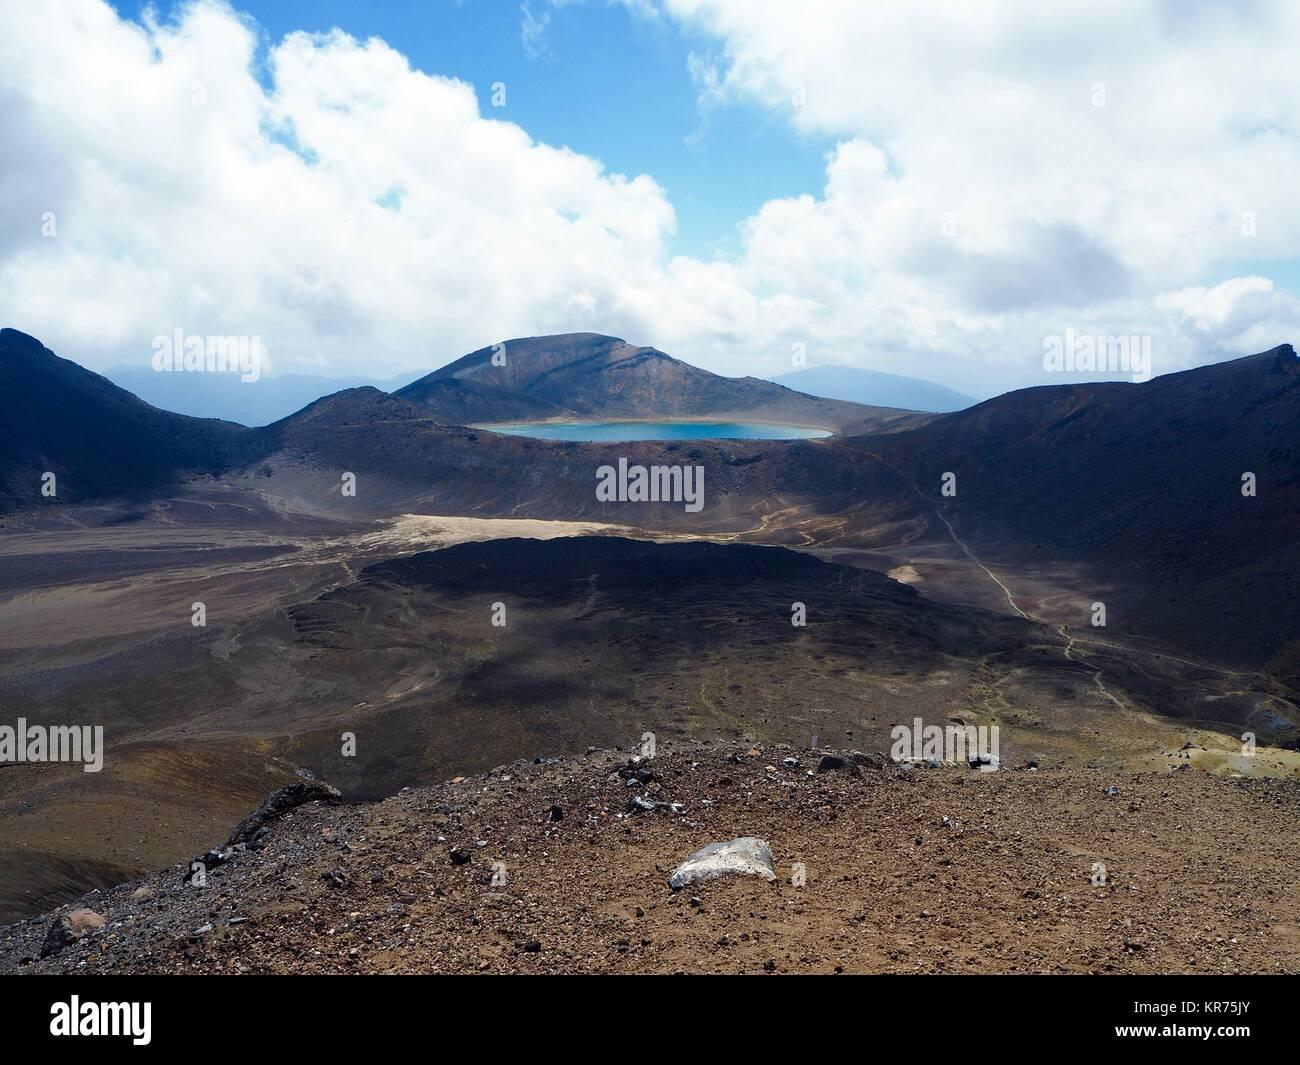 volcanic landscape - Stock Image